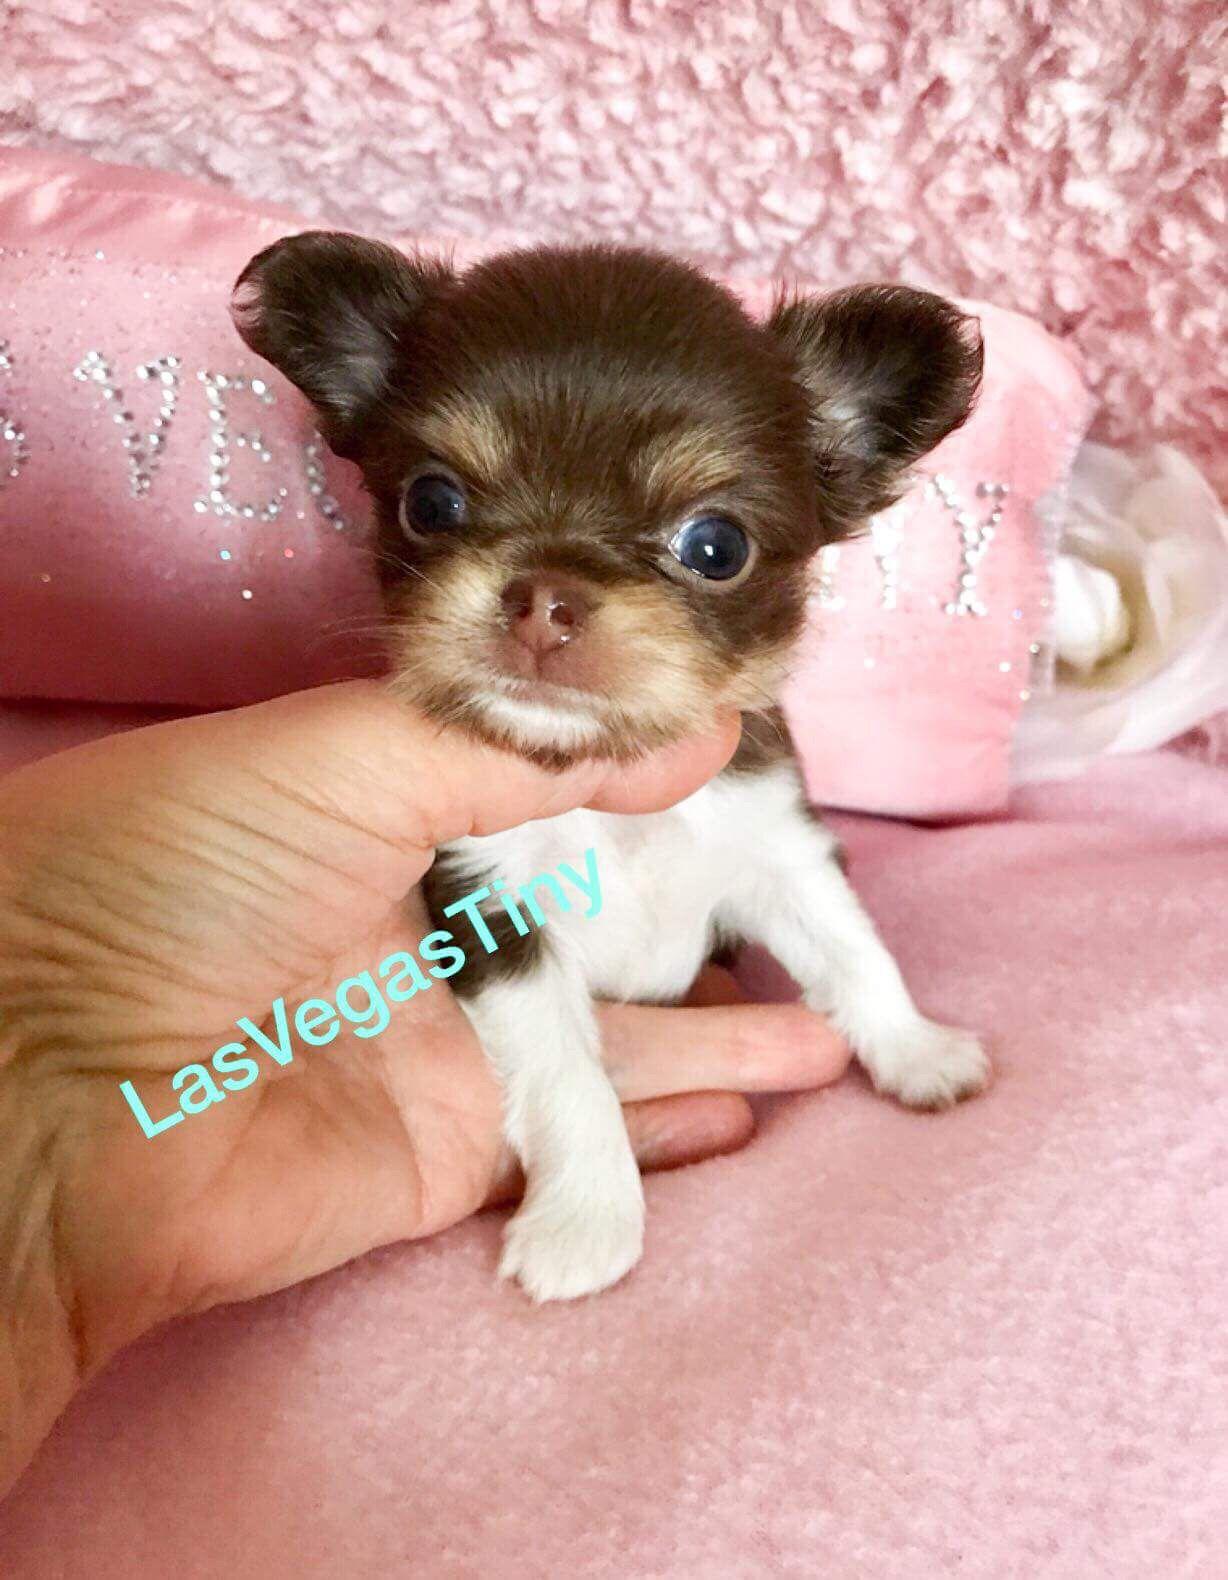 Chihuahua Chihuahuapuppy Dogs Cuteanimals Lasvegas Chihuahua